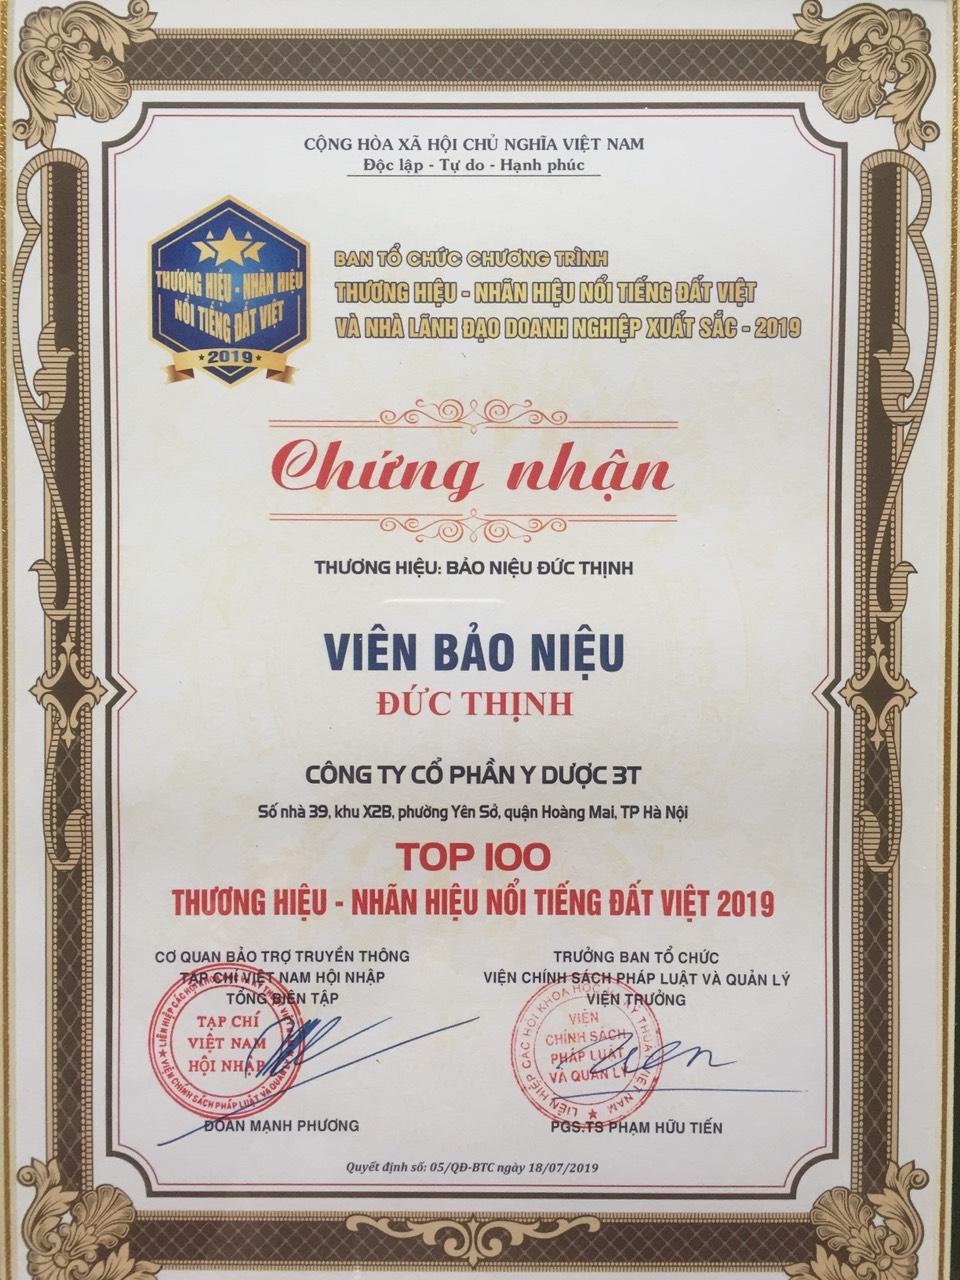 top 100 nhan hieu thuong hieu noi tieng dat viet - Giải thưởng đạt được